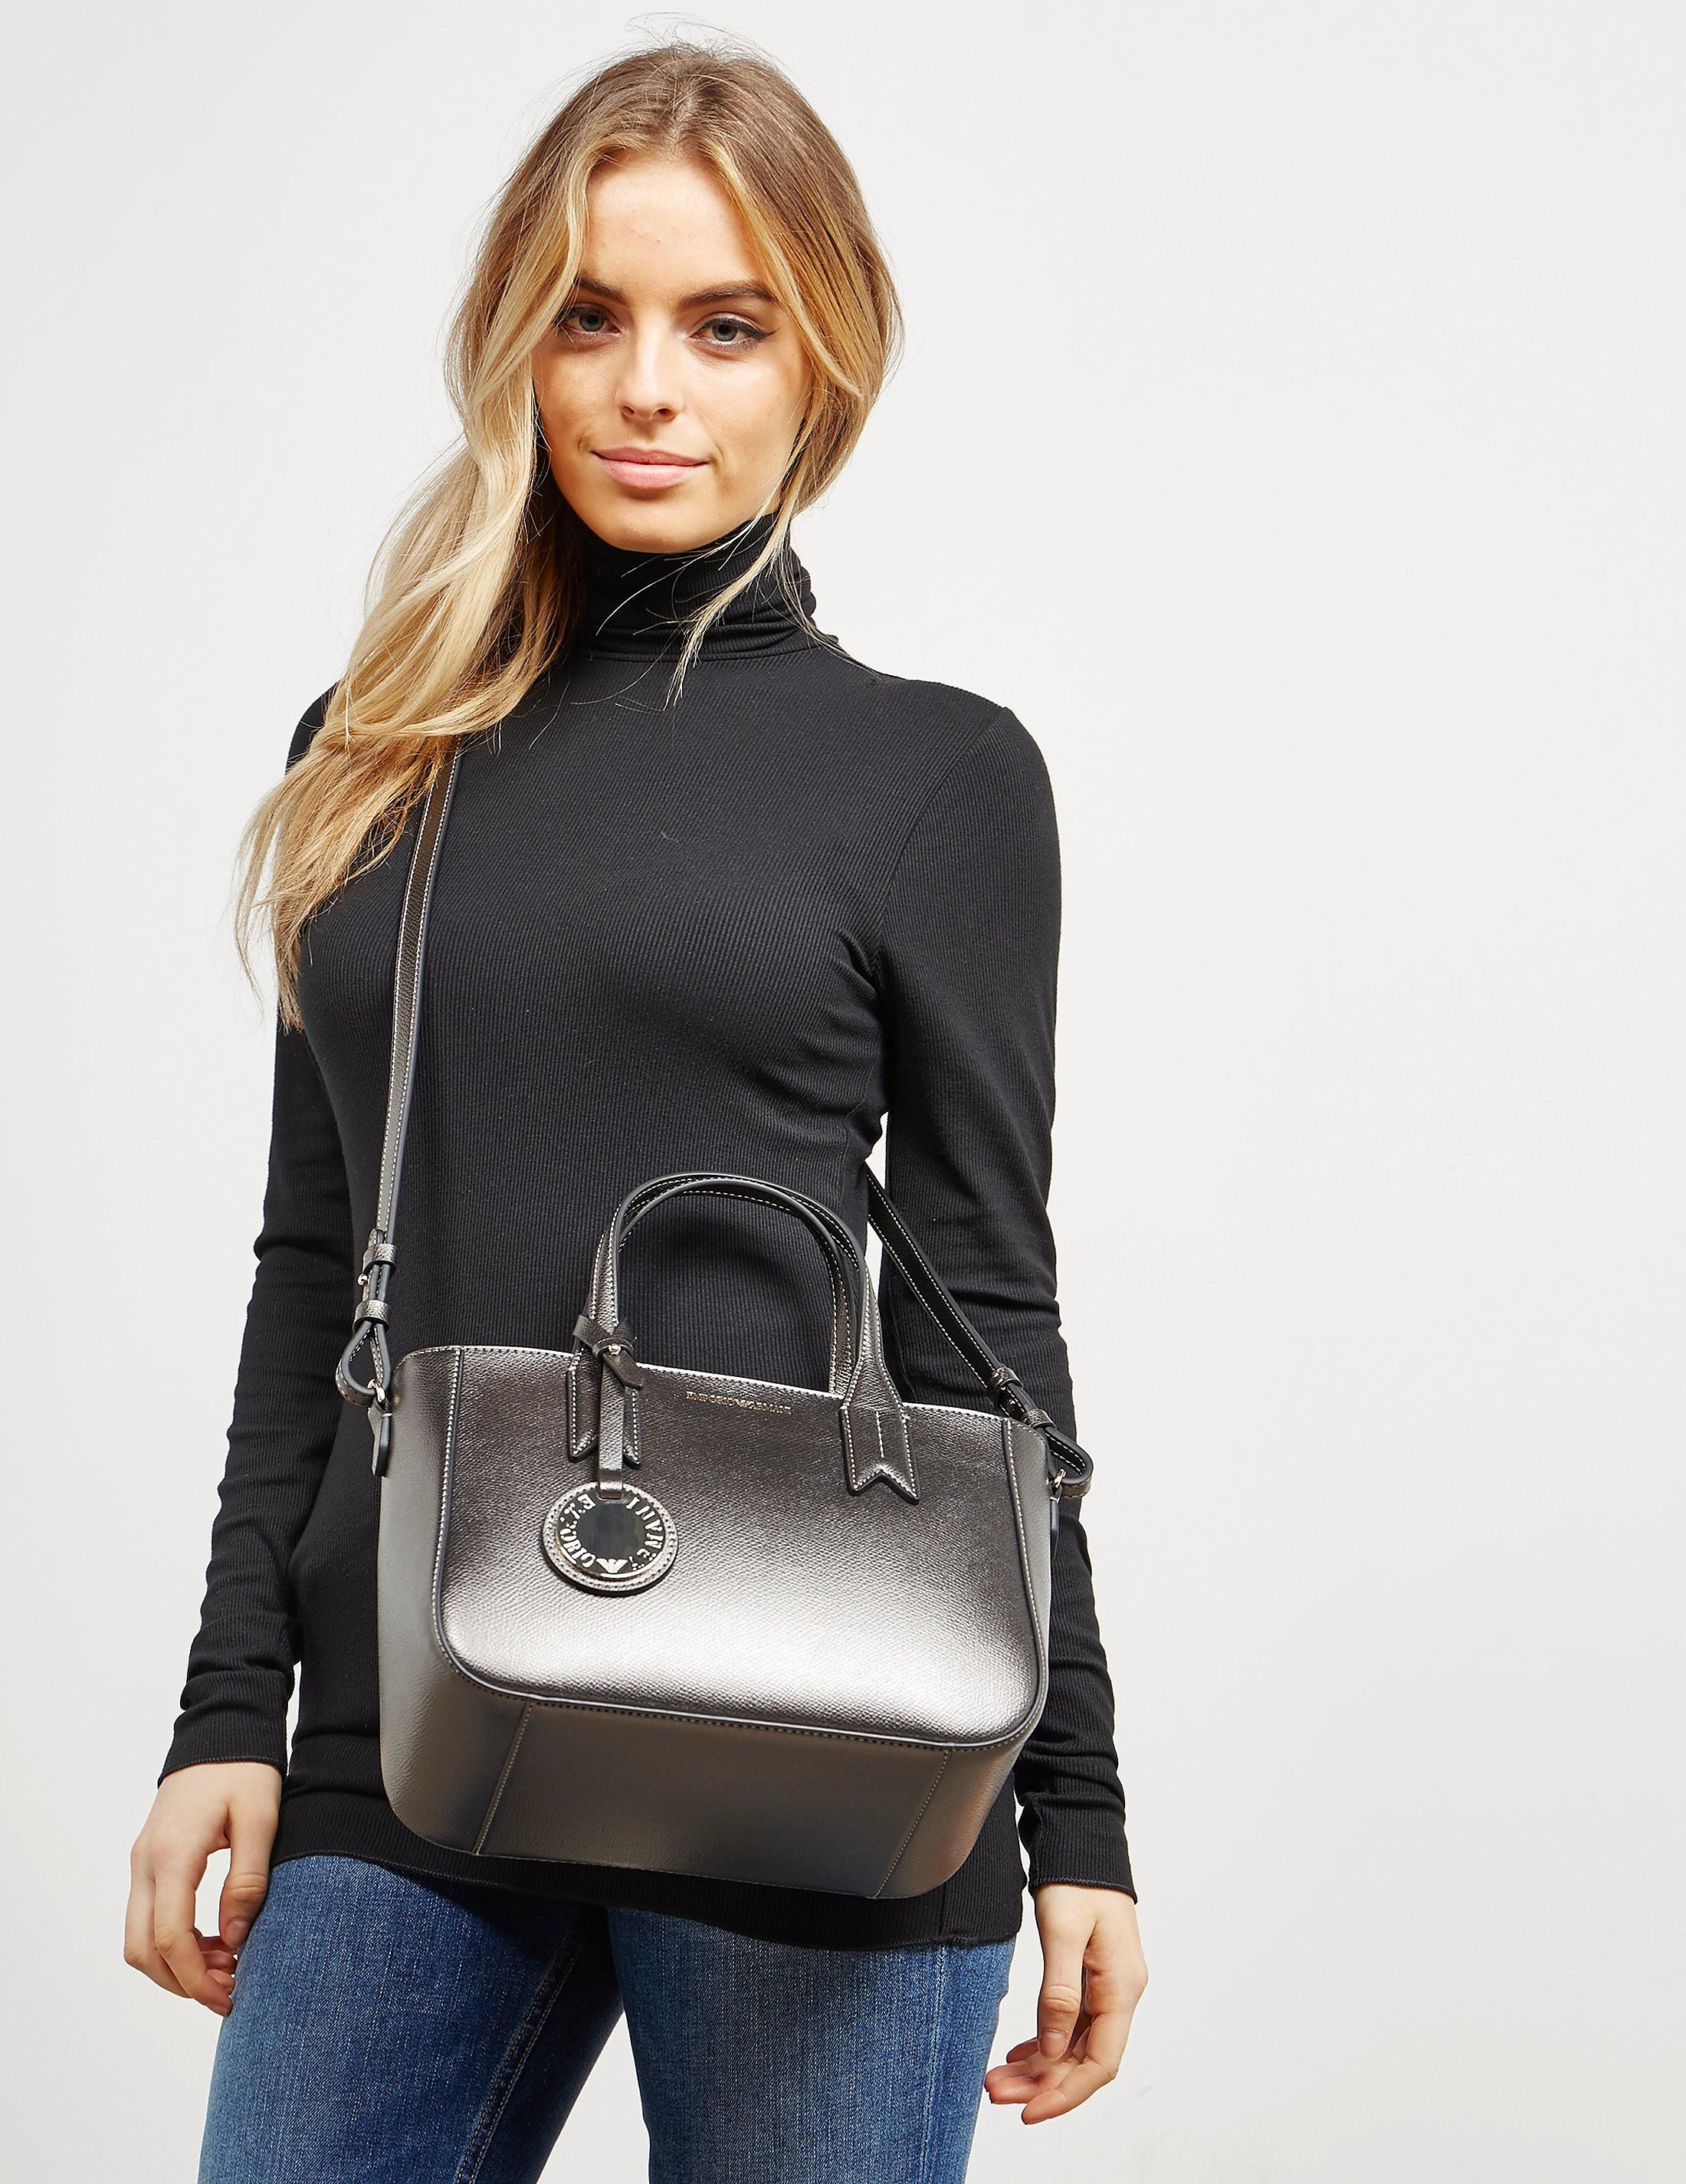 Emporio Armani Medium Shopper Bag